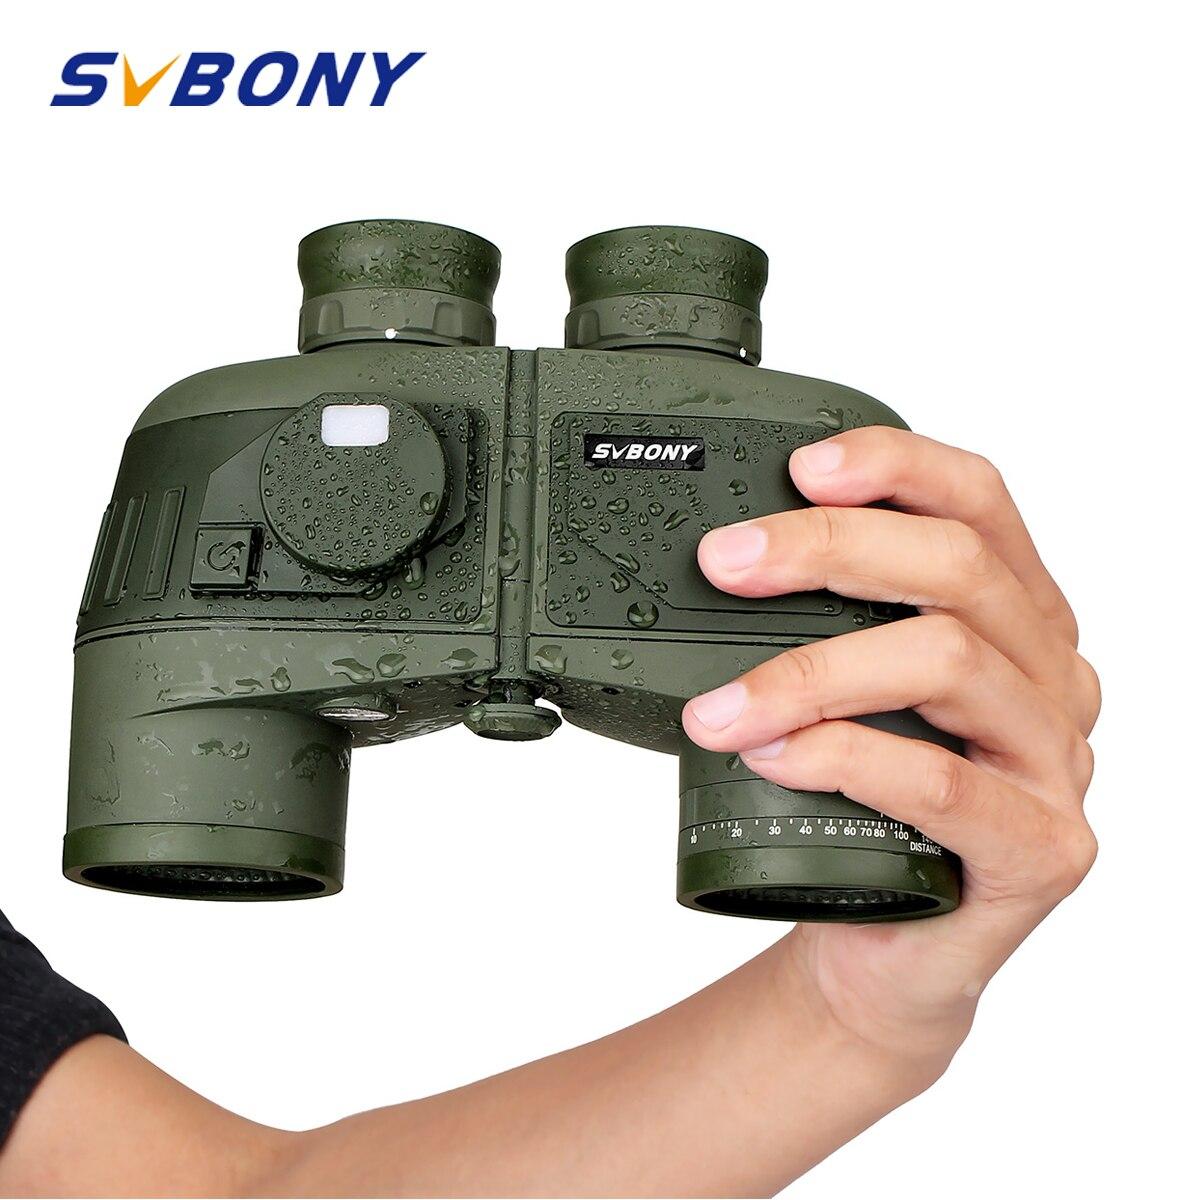 SVBONY 7x50 Military Binoculars w Internal Rangefinder Compass Waterproof Floating Marine Powerful Telescope SV27 F9307